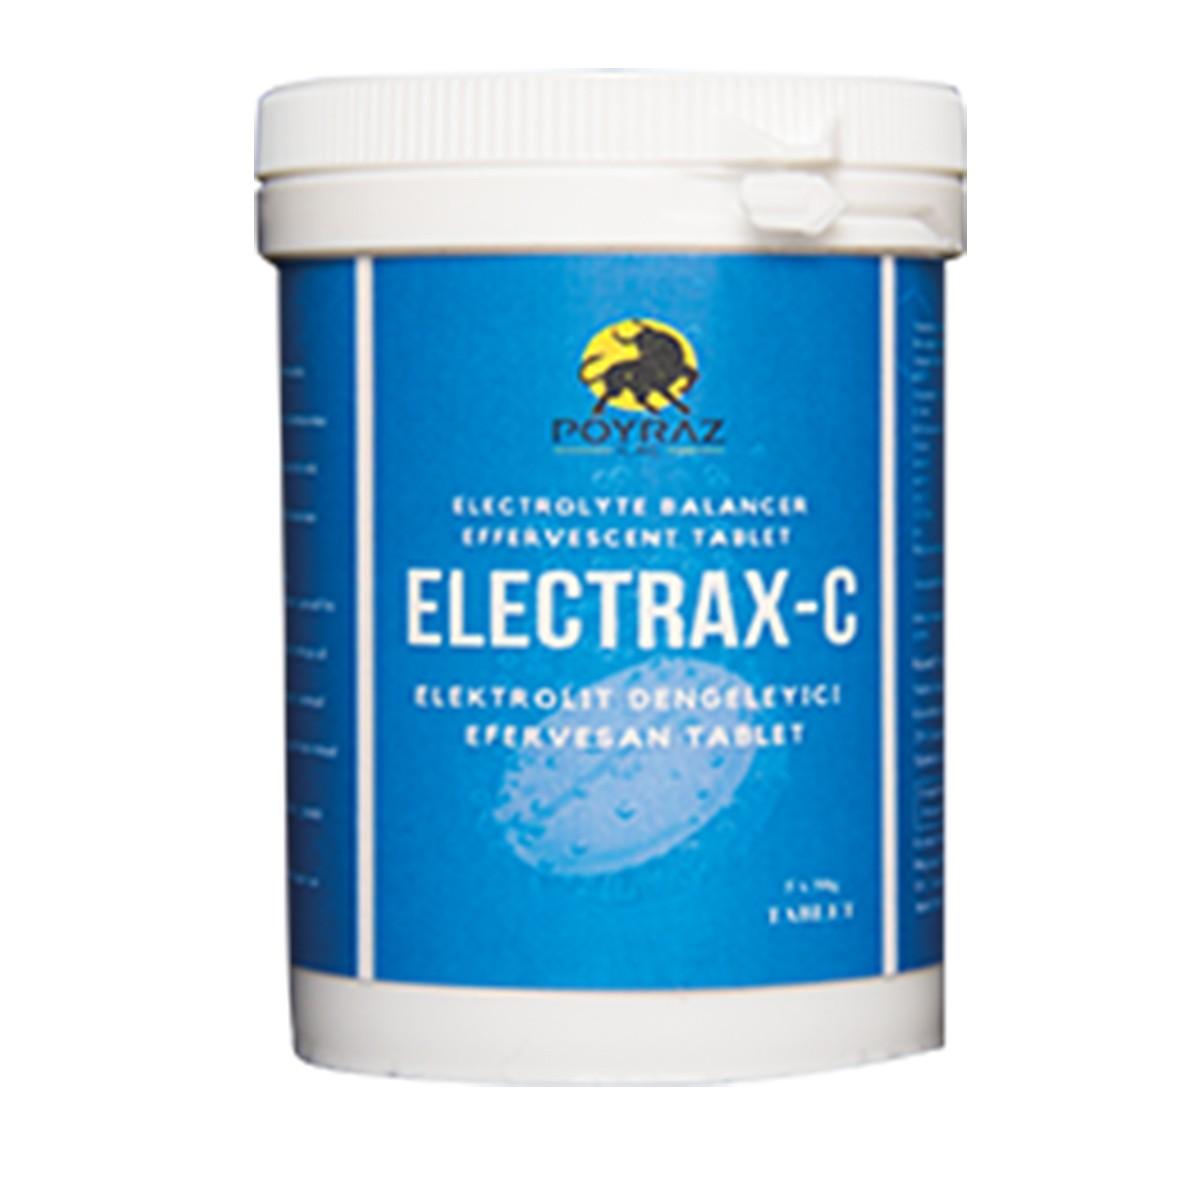 ELECTRAX-C